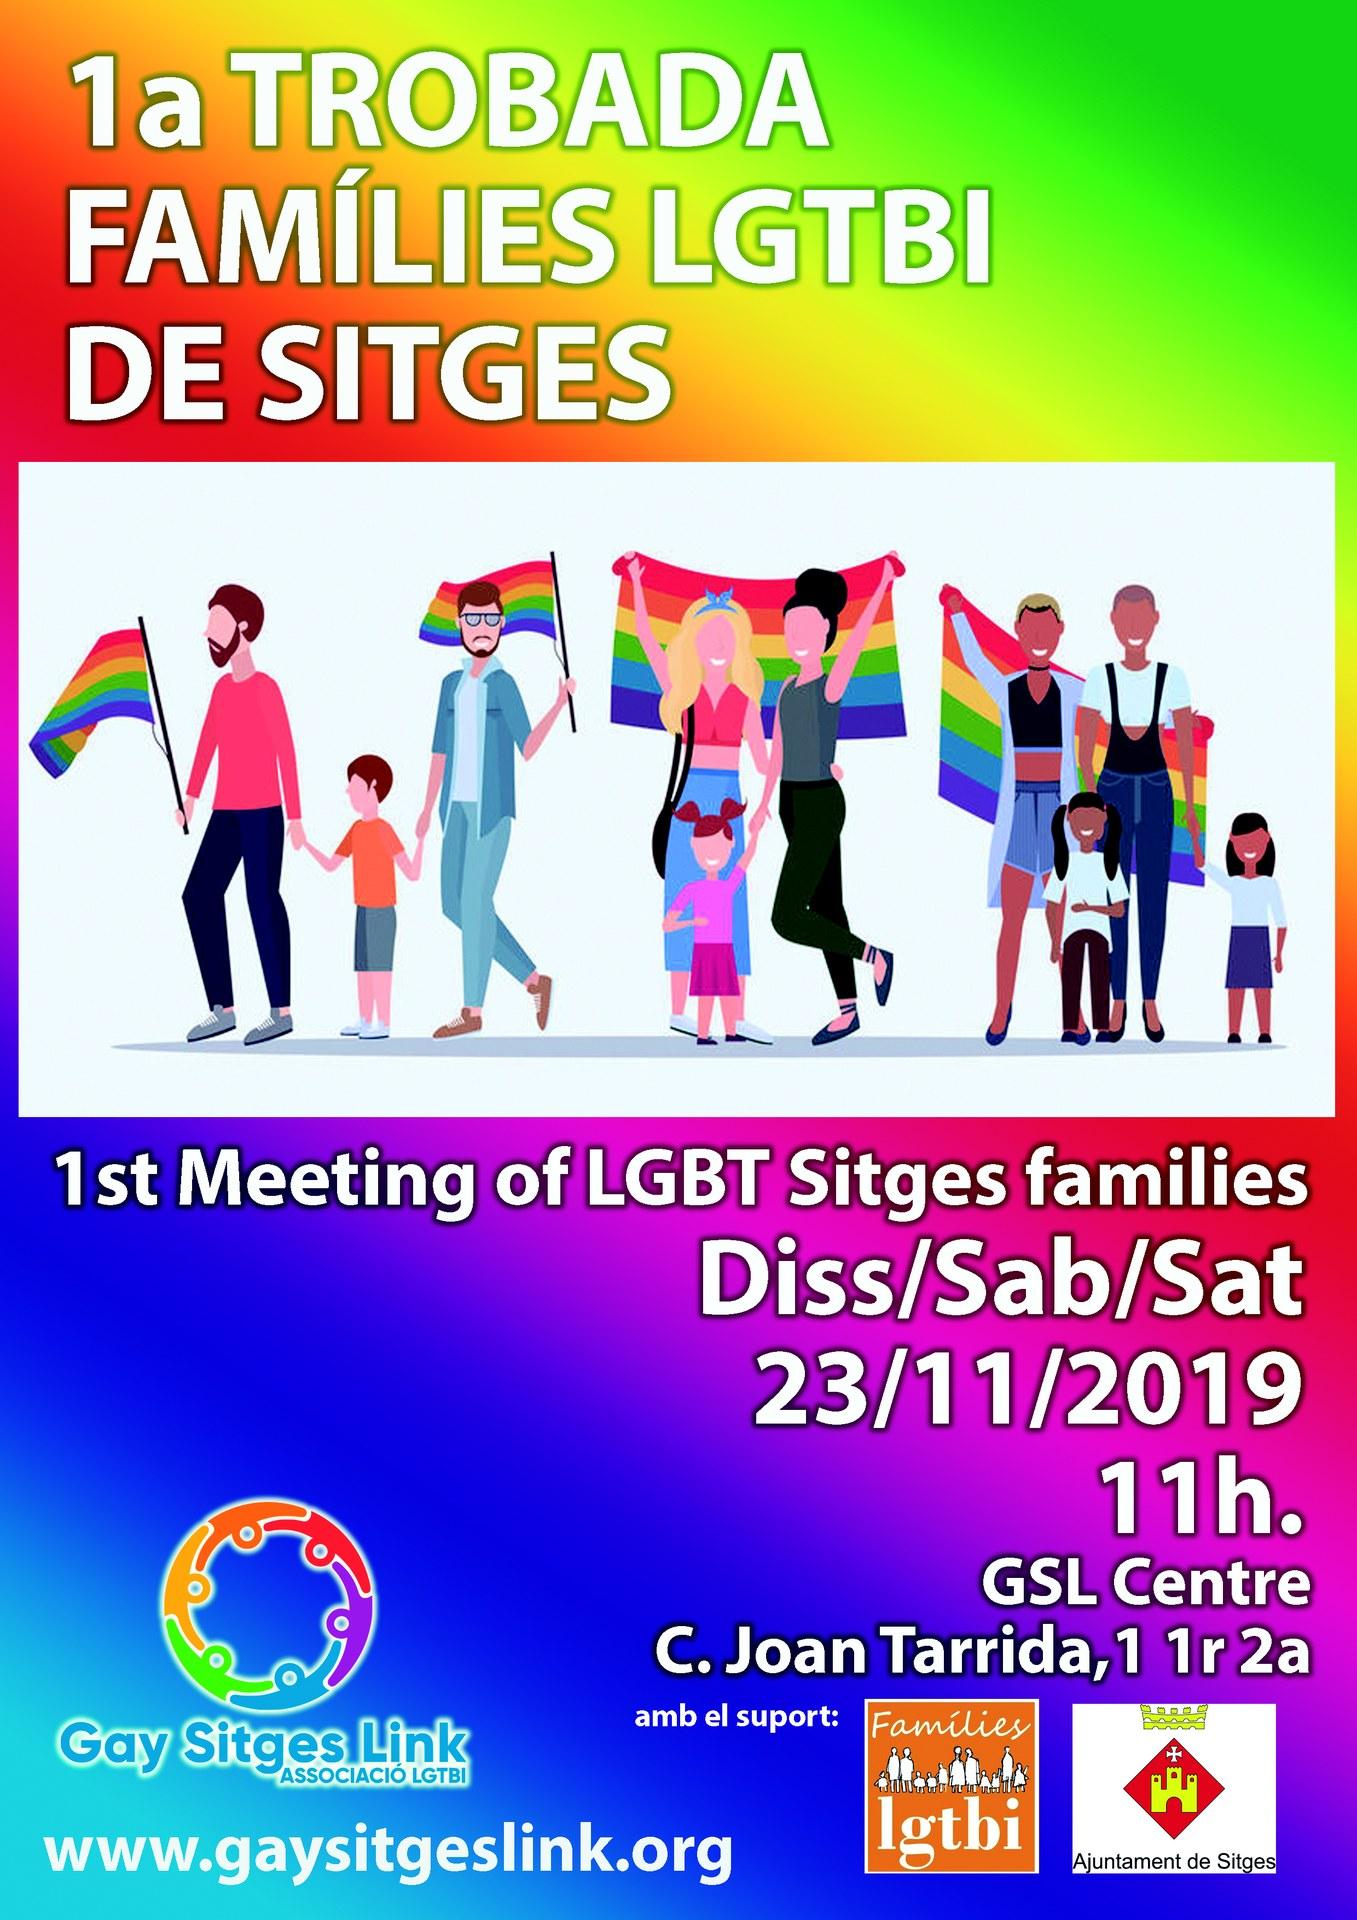 Trobada famílies LGTBI de Sitges